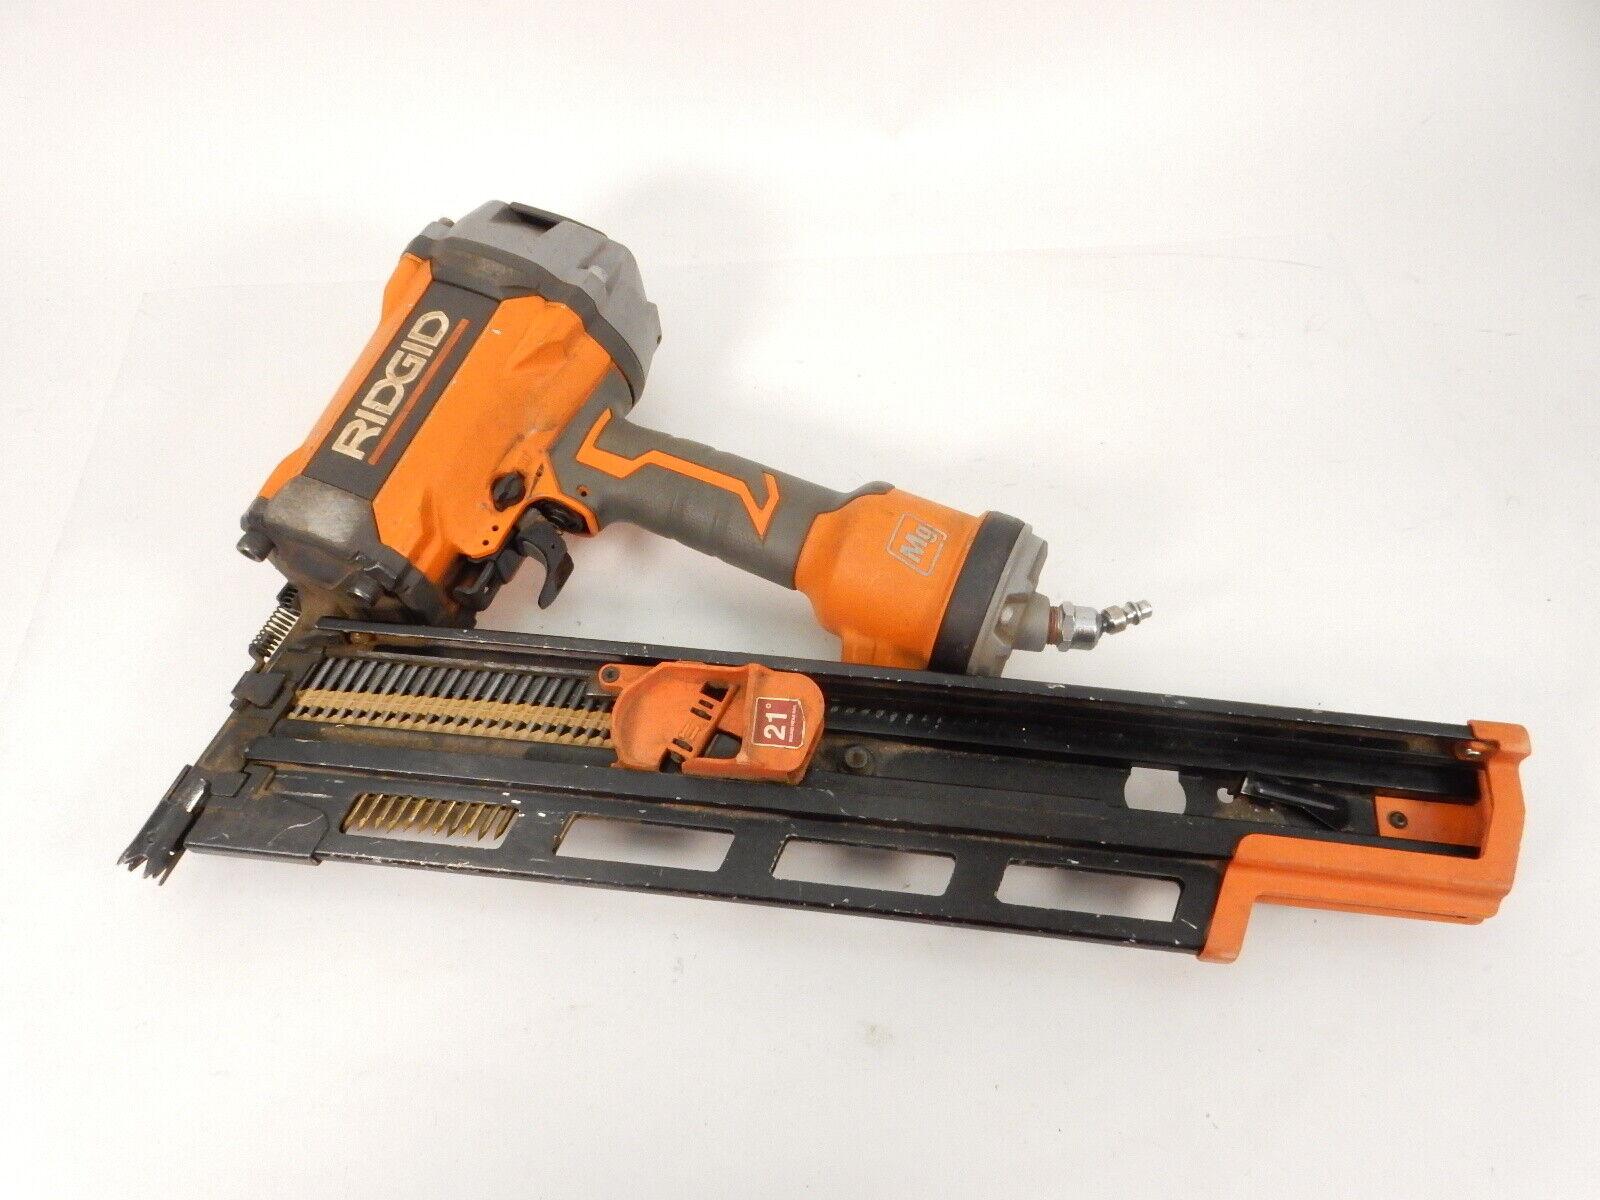 Ridgid R350RHF 21° 3-1/2 in. Round-Head Framing Nailer. Buy it now for 129.92